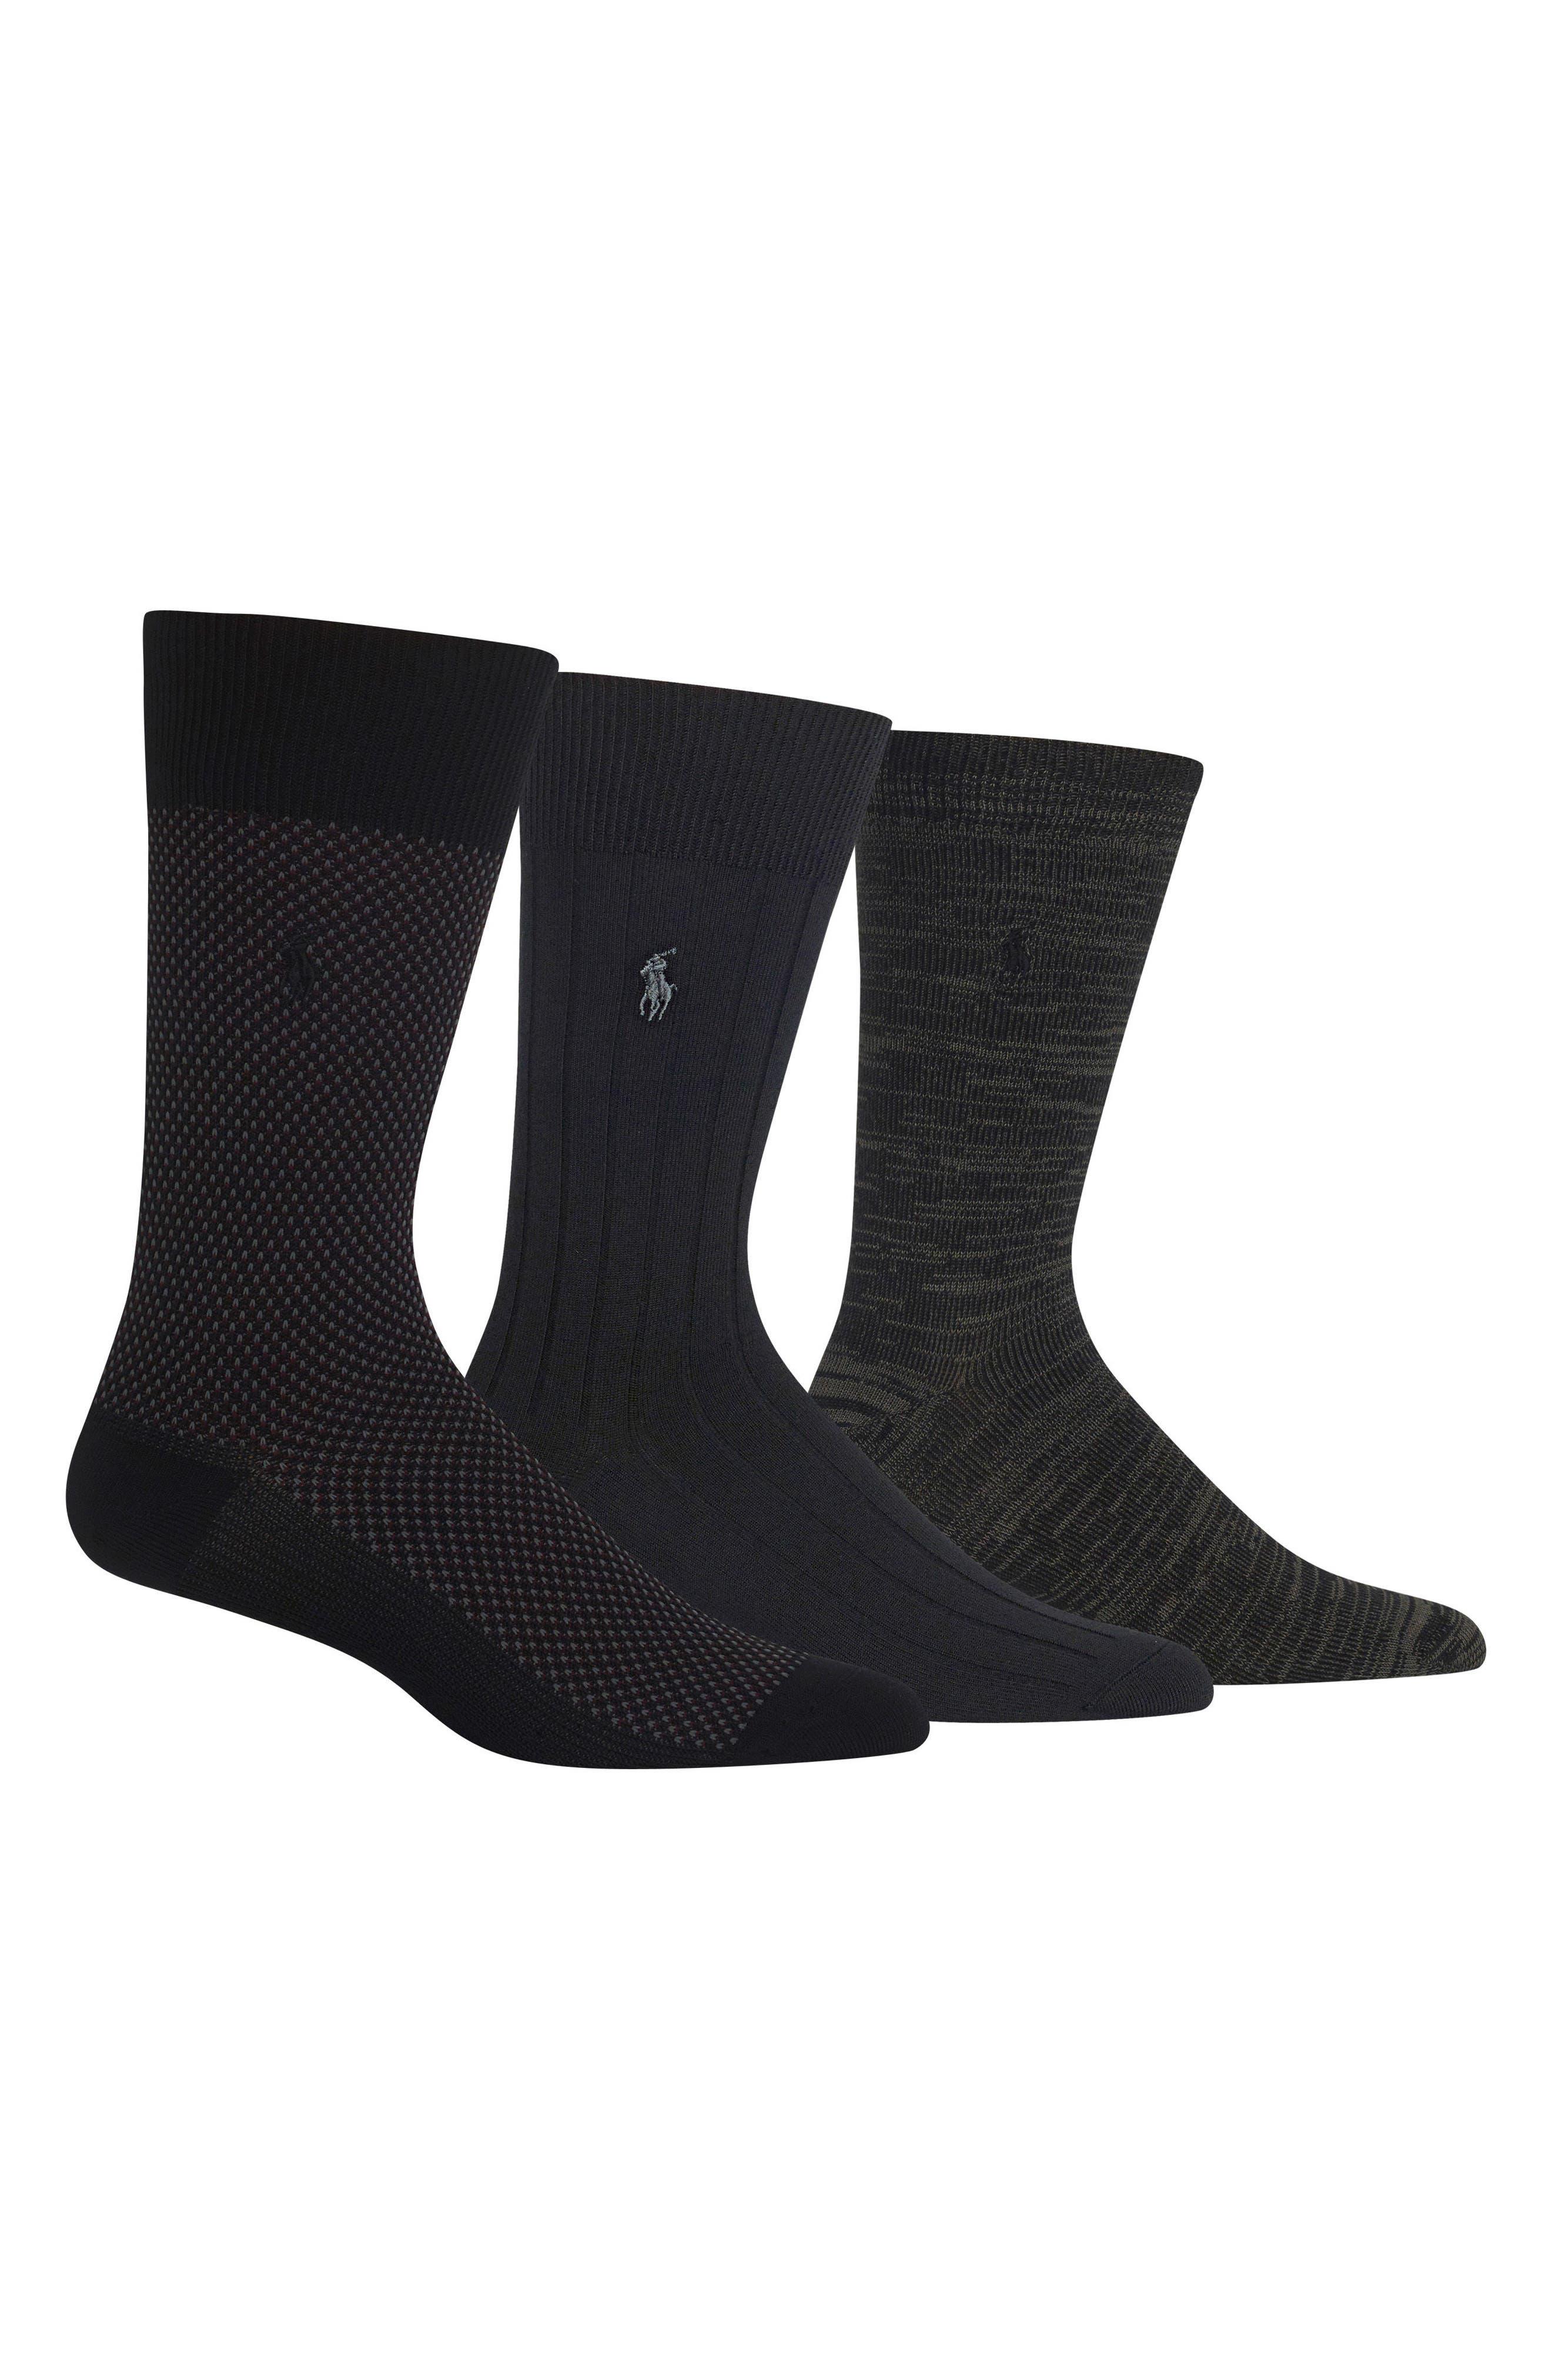 Assorted 3-Pack Bird's Eye Socks, Main, color, BLACK